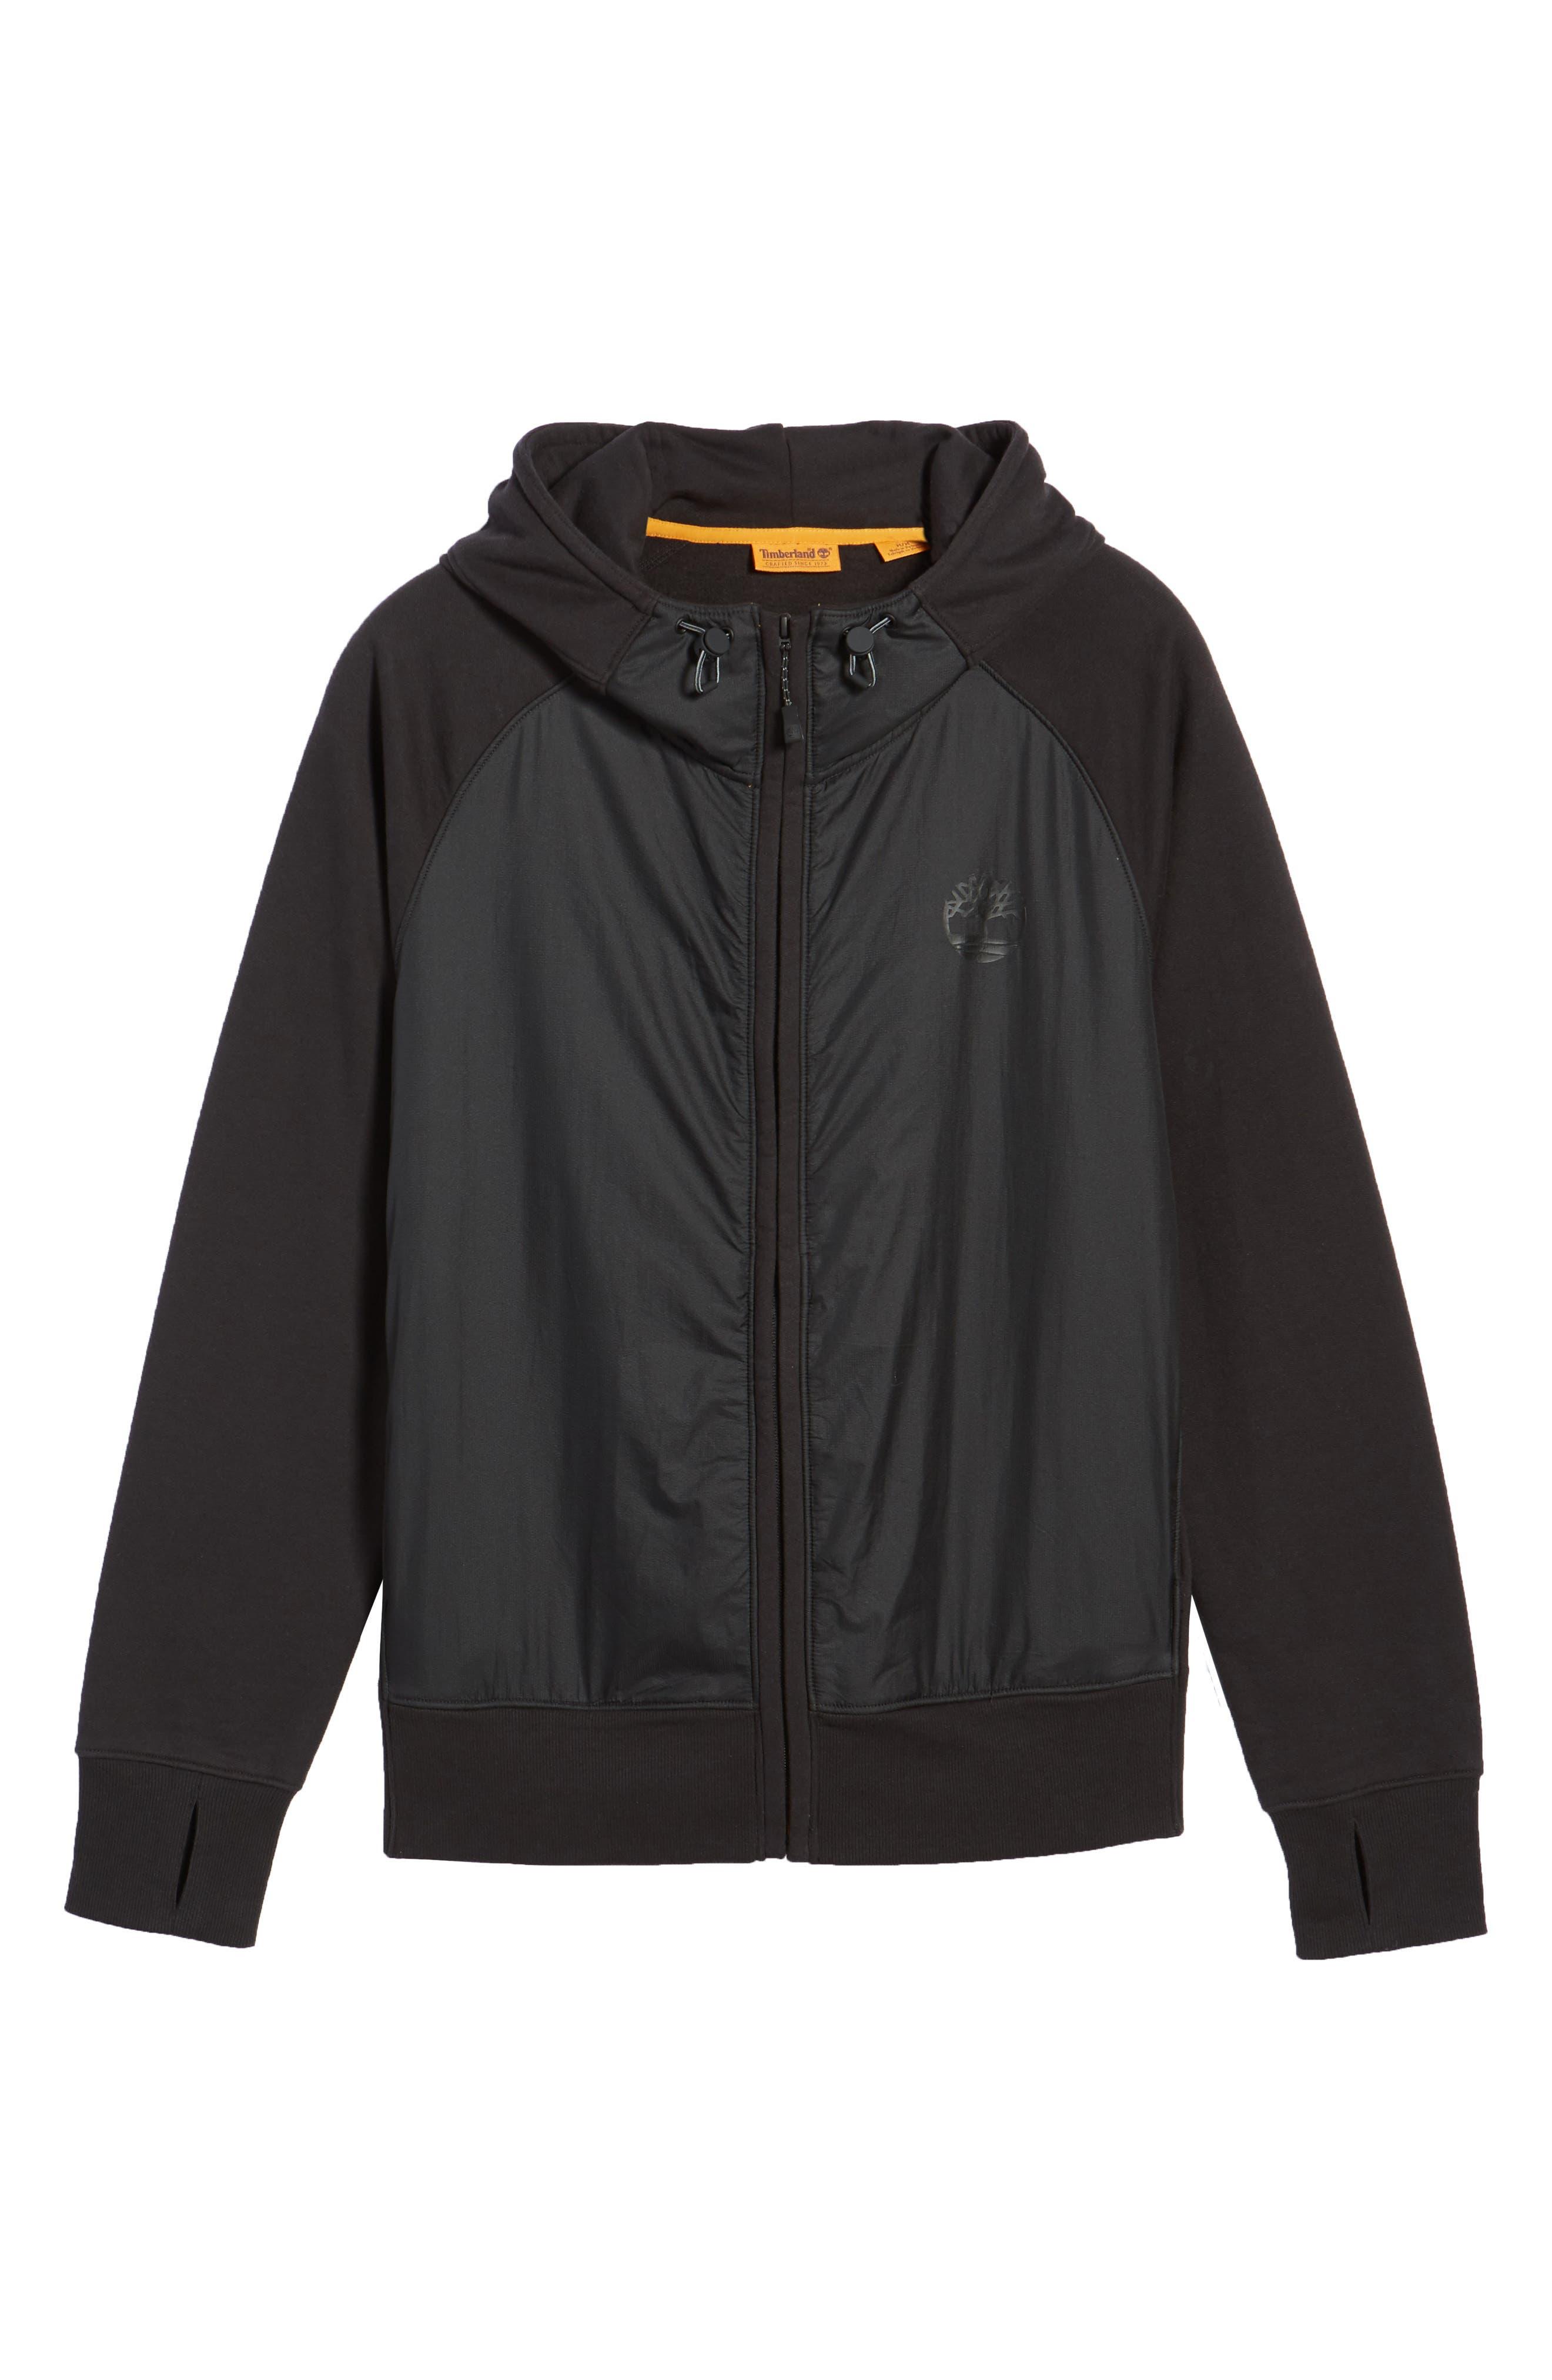 Mixed Media Hooded Jacket,                             Alternate thumbnail 6, color,                             001